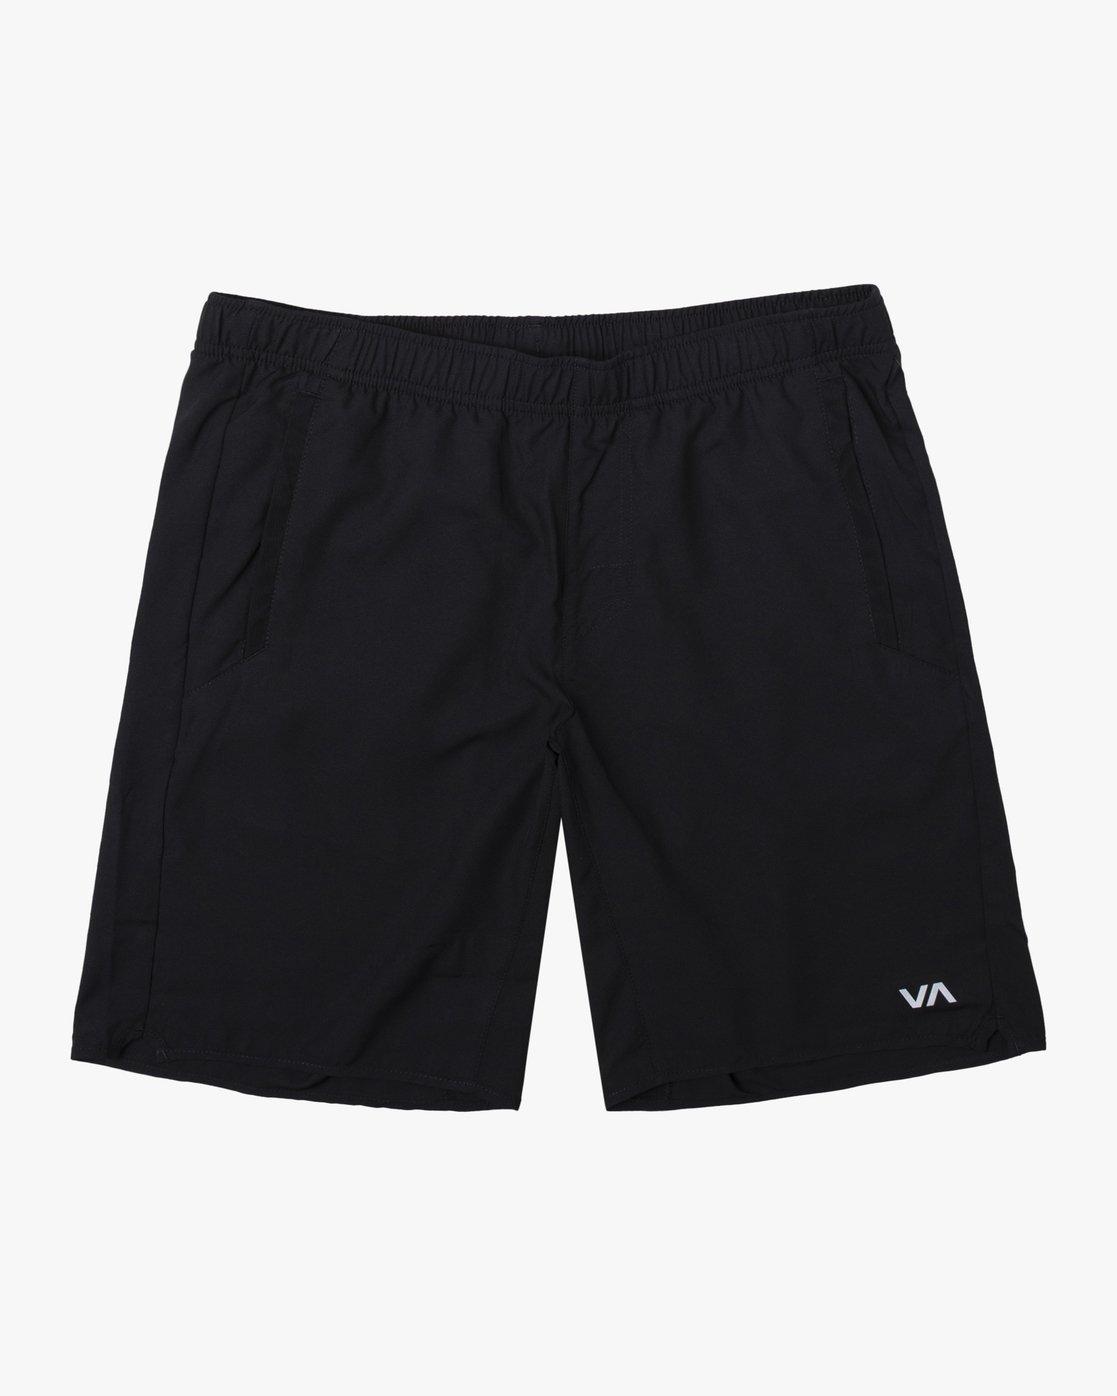 0 YOGGER IV SHORT 19 Black V2101RYG RVCA